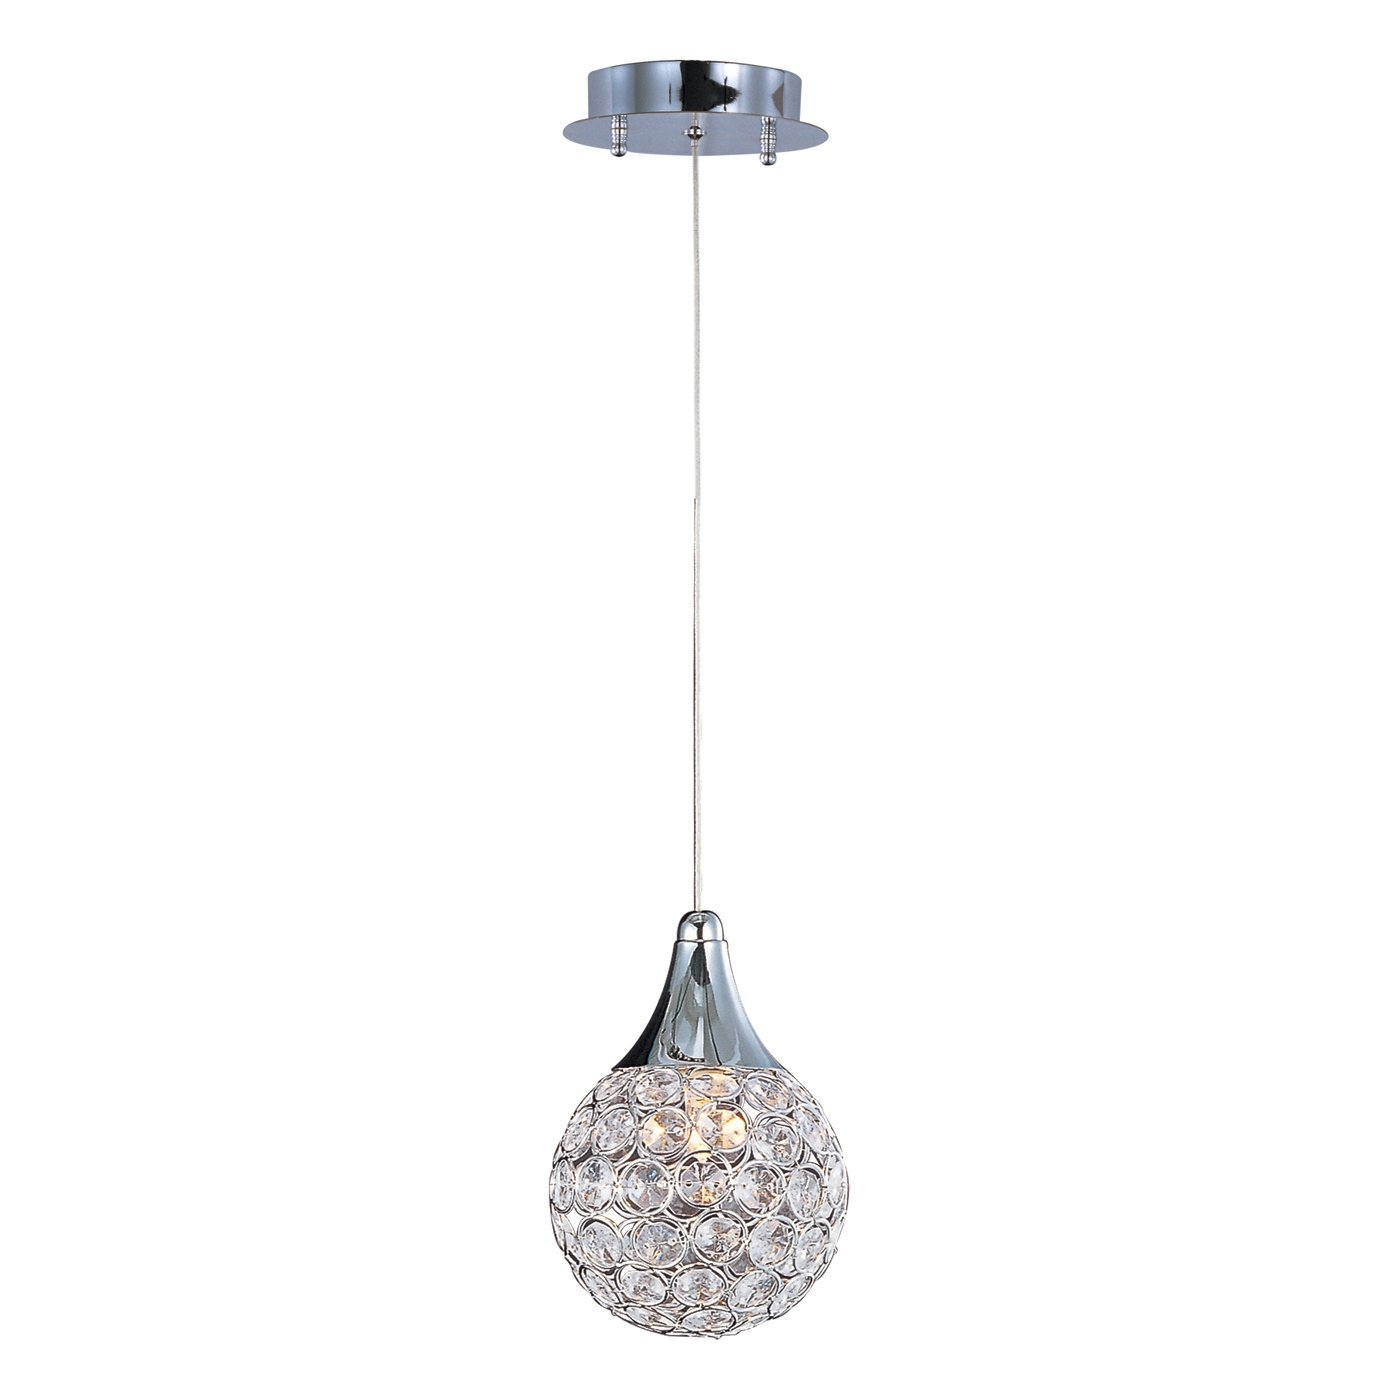 Modern Crystal Pendant Lamp Lights For Kitchen Hall Bar Dia15cm Round Ball Chandelier Pendant Haning Lamp Home Luminaire Fixture цены